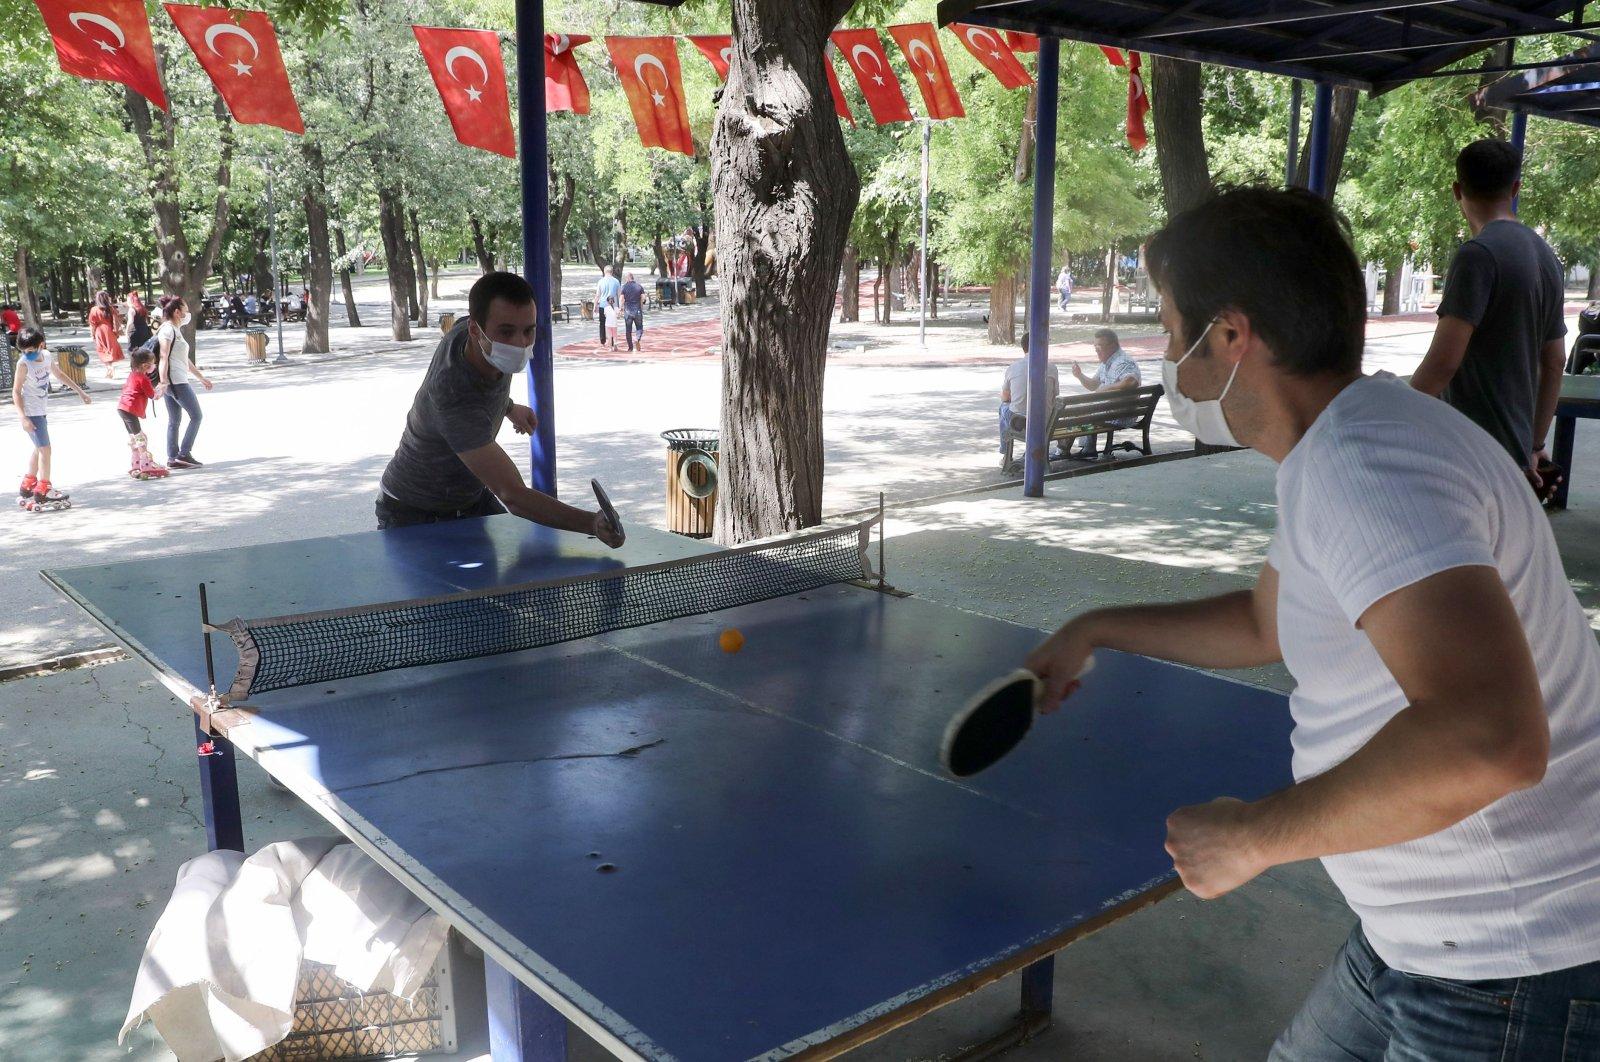 Two men wearing protective masks play table tennis at Kurtuluş Park, in the capital Ankara, Turkey, July 26, 2020. (AFP Photo)